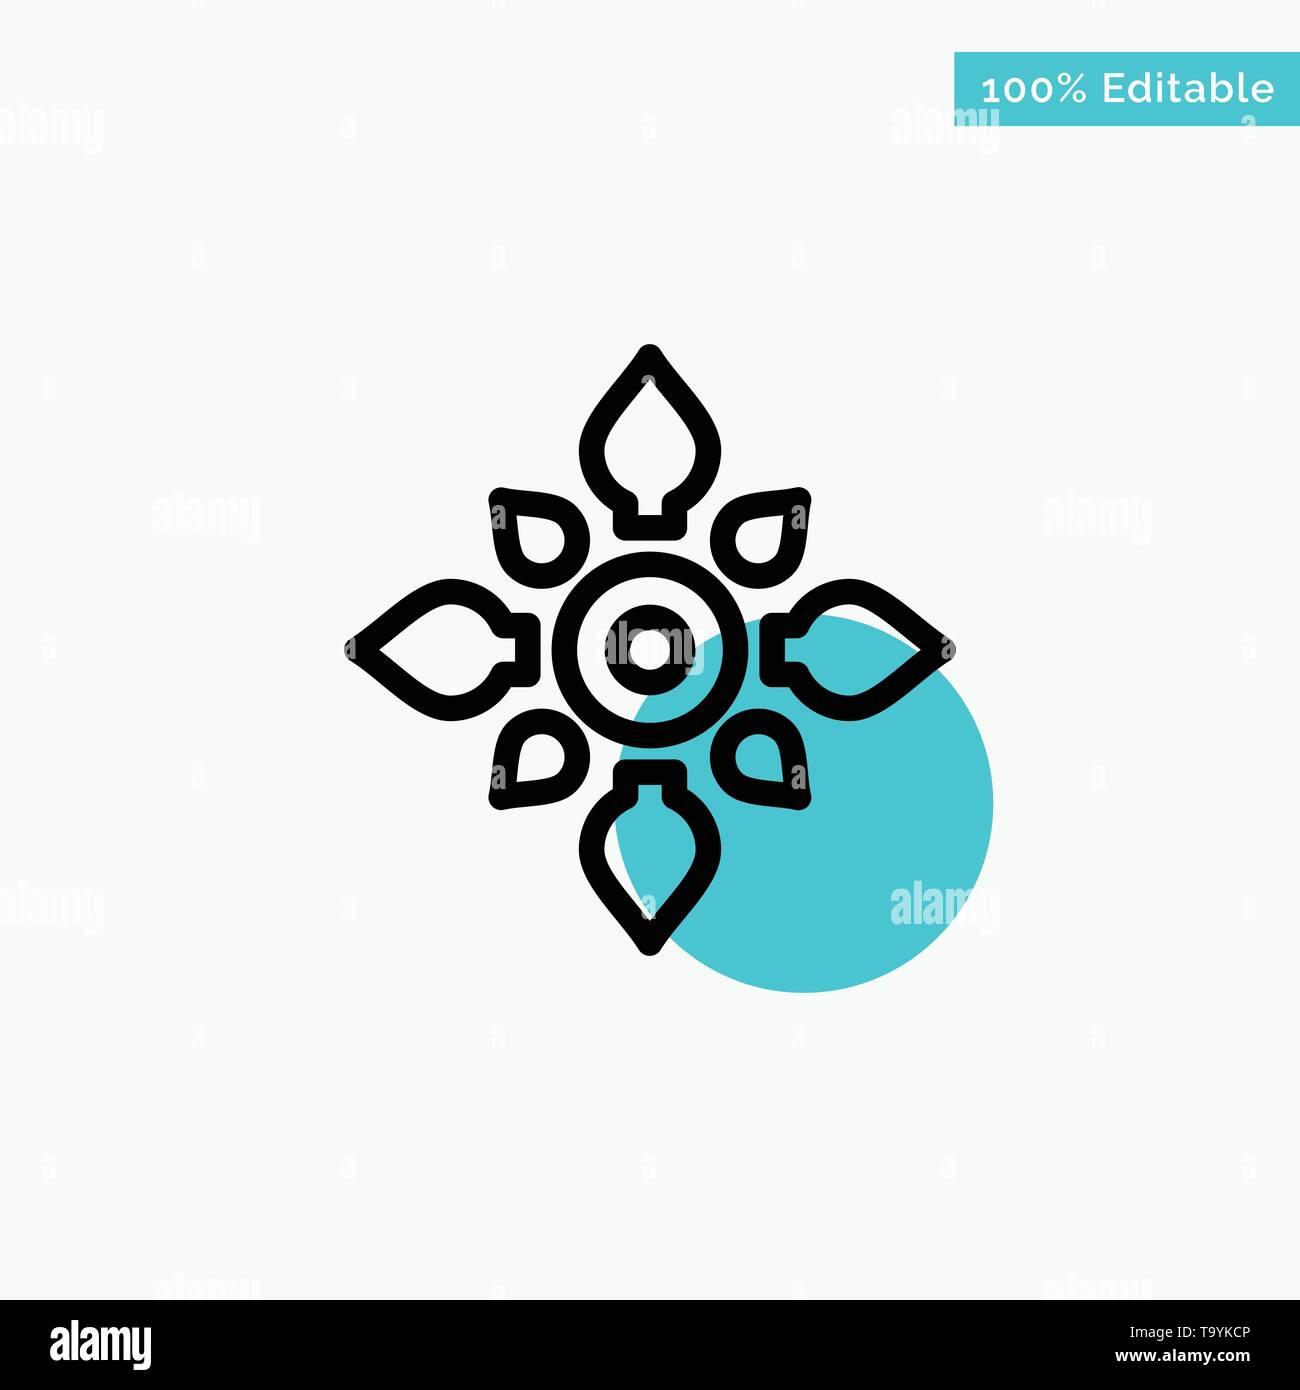 Celebrate, Decorate, Decoration, Diwali, Hindu, Holi turquoise highlight circle point Vector icon - Stock Image